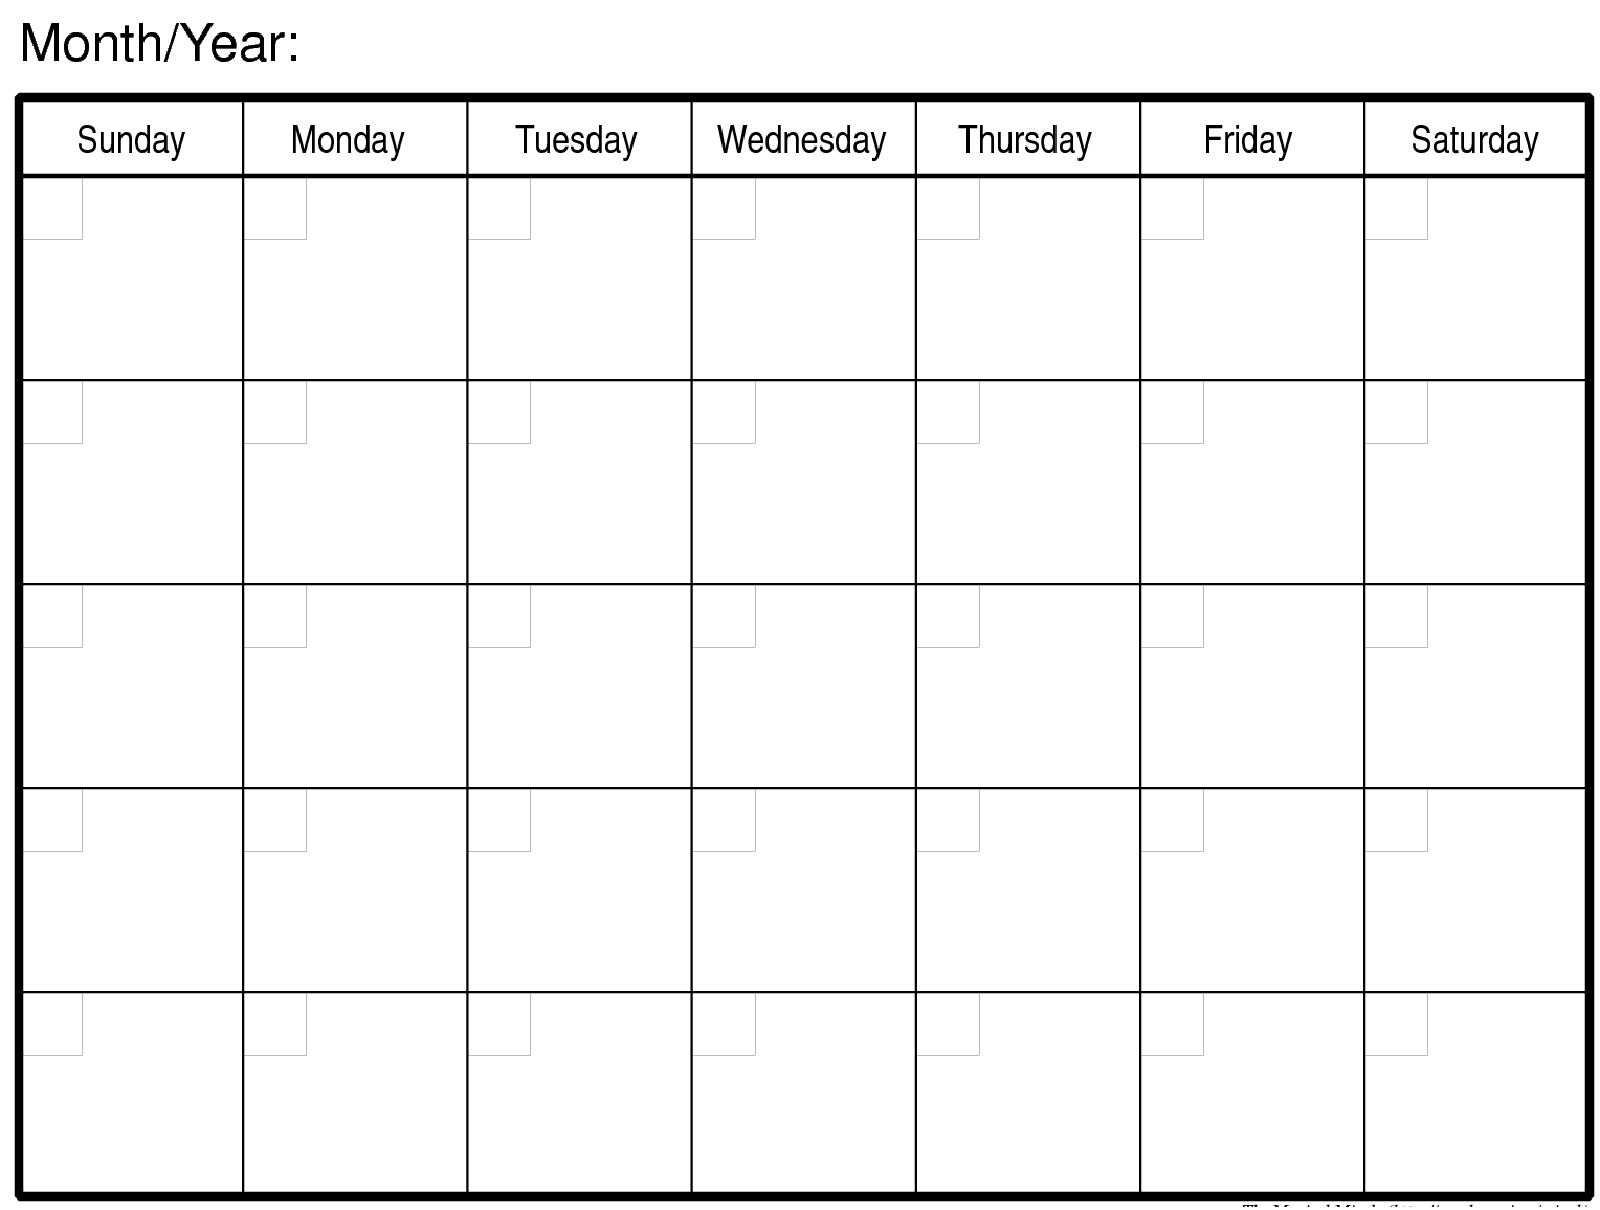 blank calendar month printable free calendar template 2018. Black Bedroom Furniture Sets. Home Design Ideas